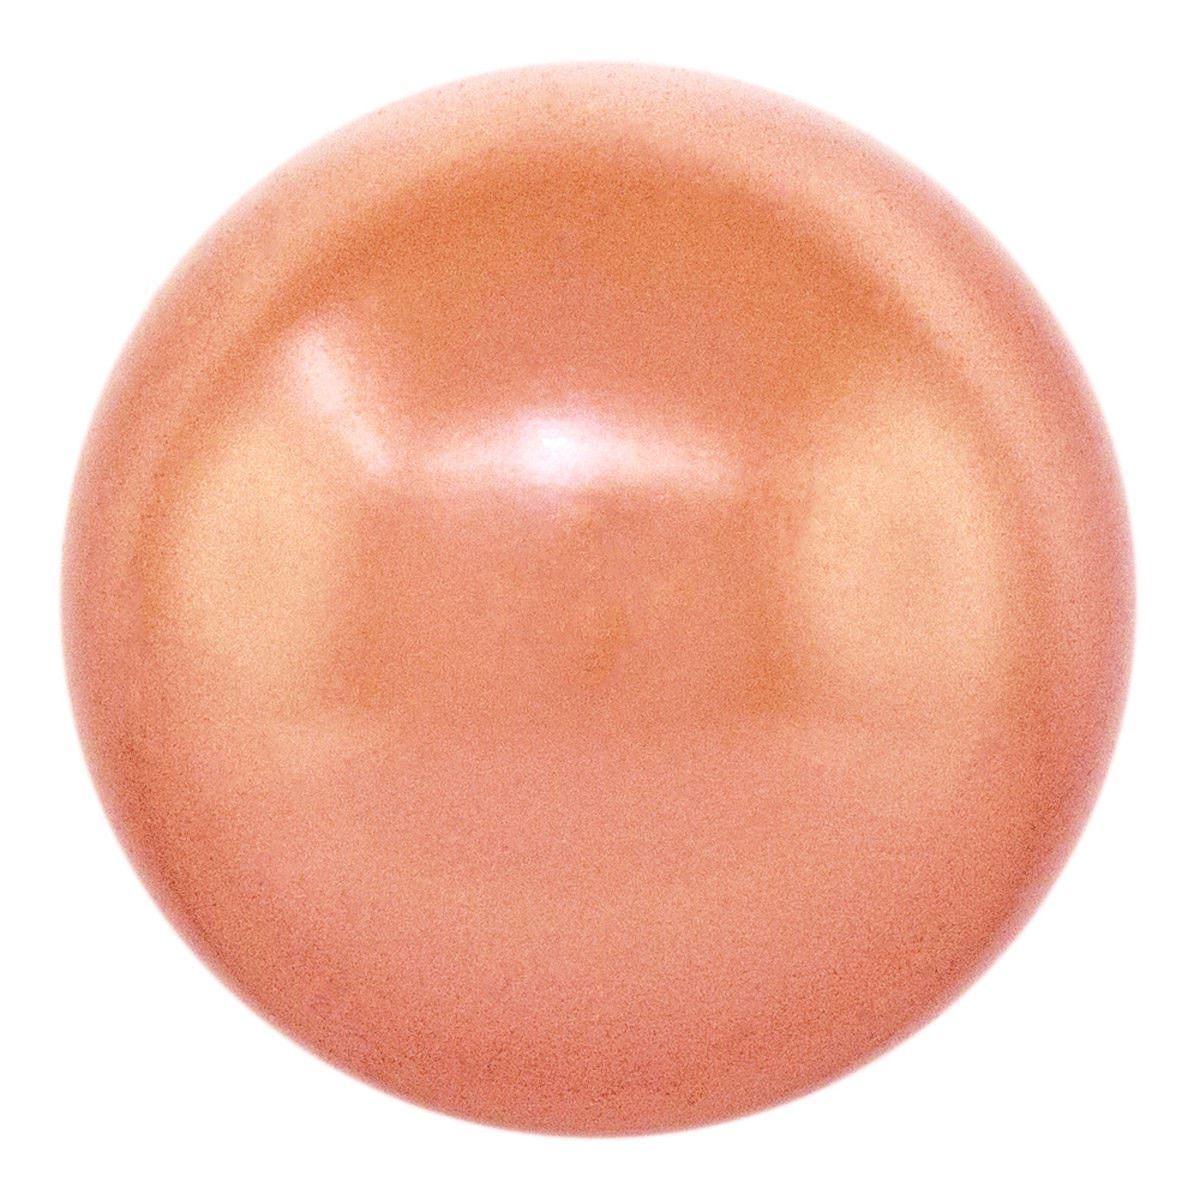 Розовый жемчуг  6.42 Ct  10.36 х 10.31 х 7.35  мм  Сертификат